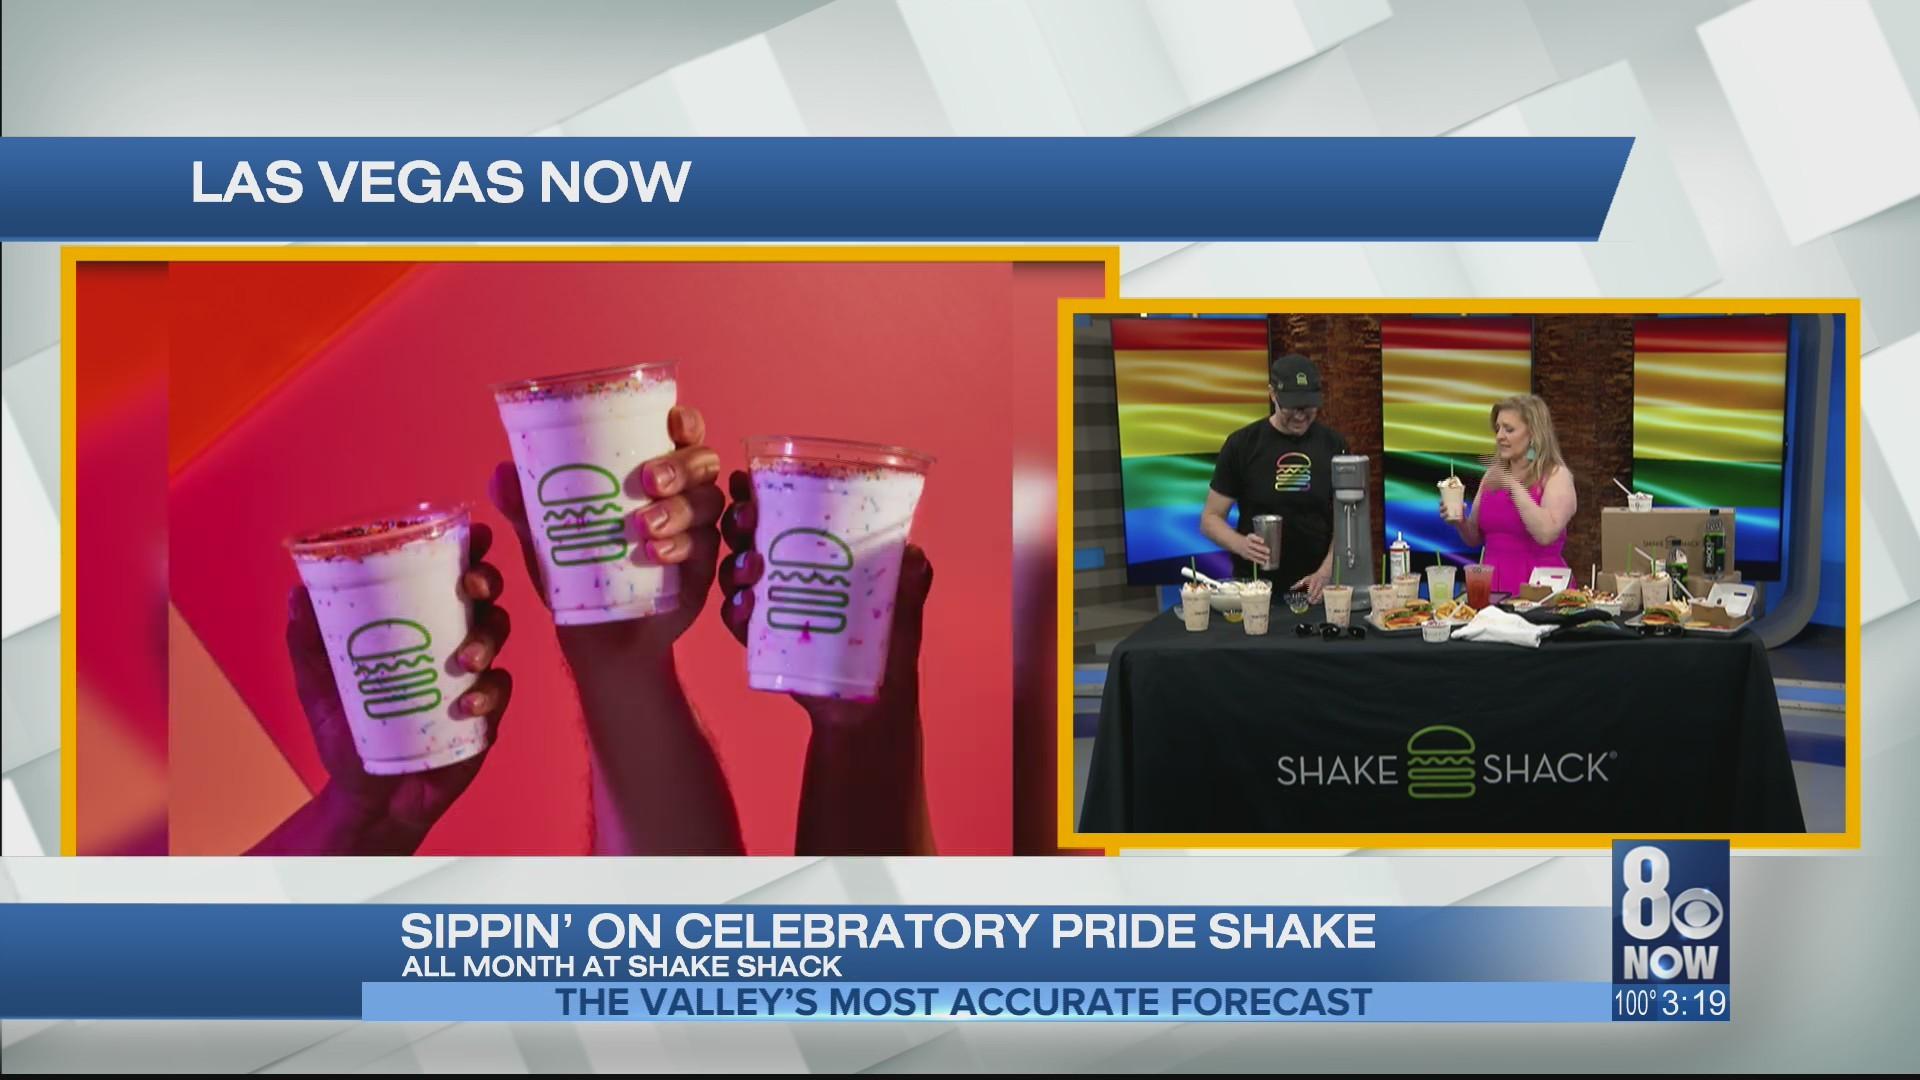 Sippin' on celebratory pride shake with Shake Shack